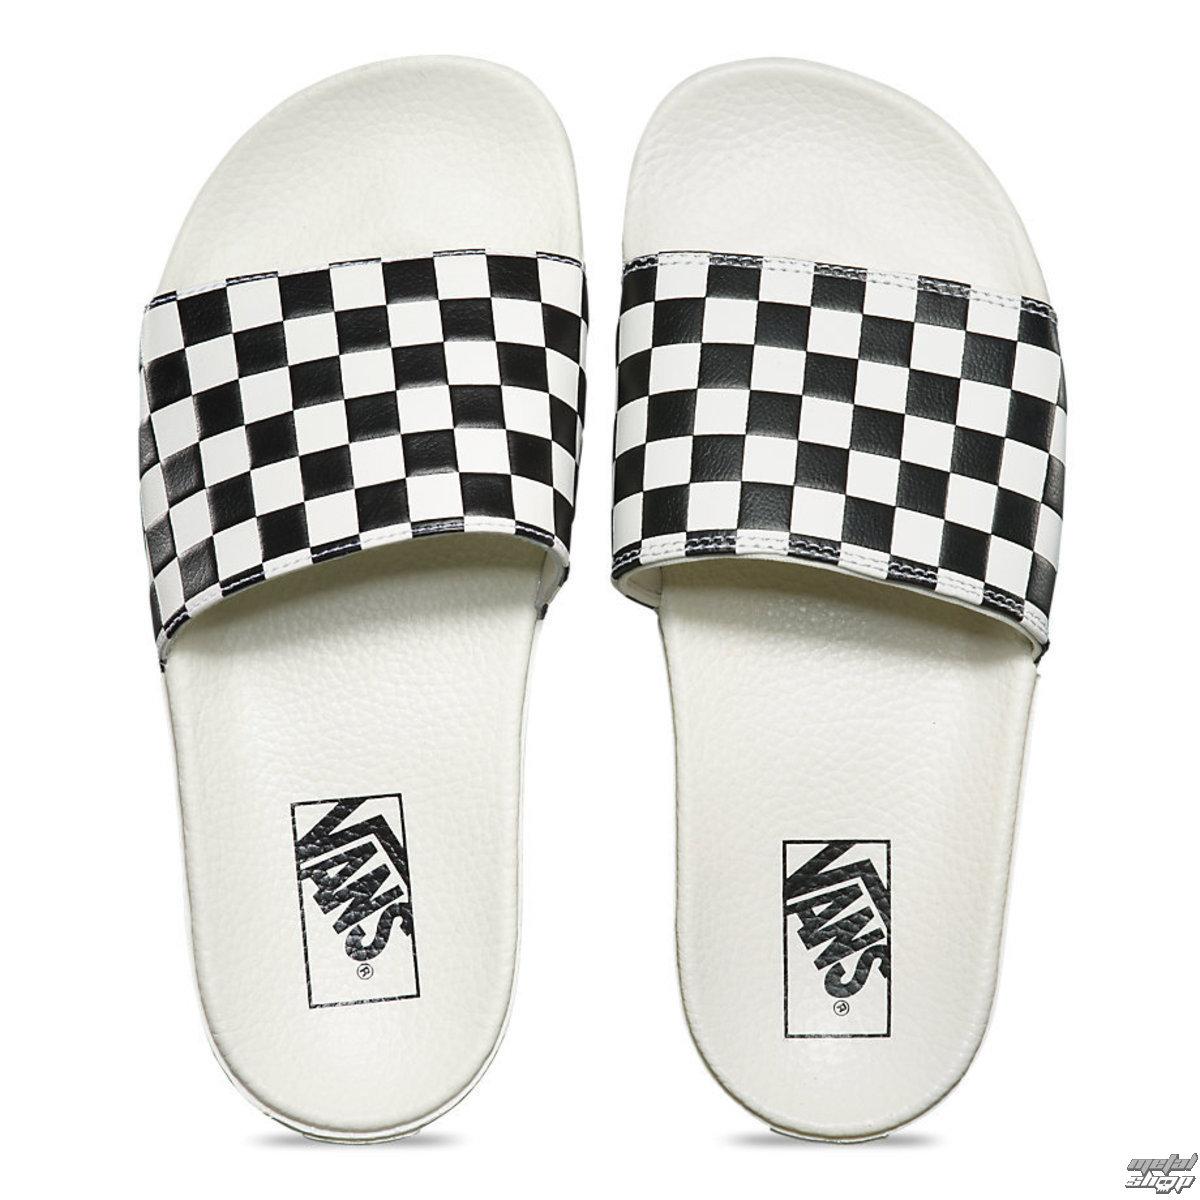 sandály dámské VANS - Slide-On (Checkerboard) - White/Black - V4LG27K